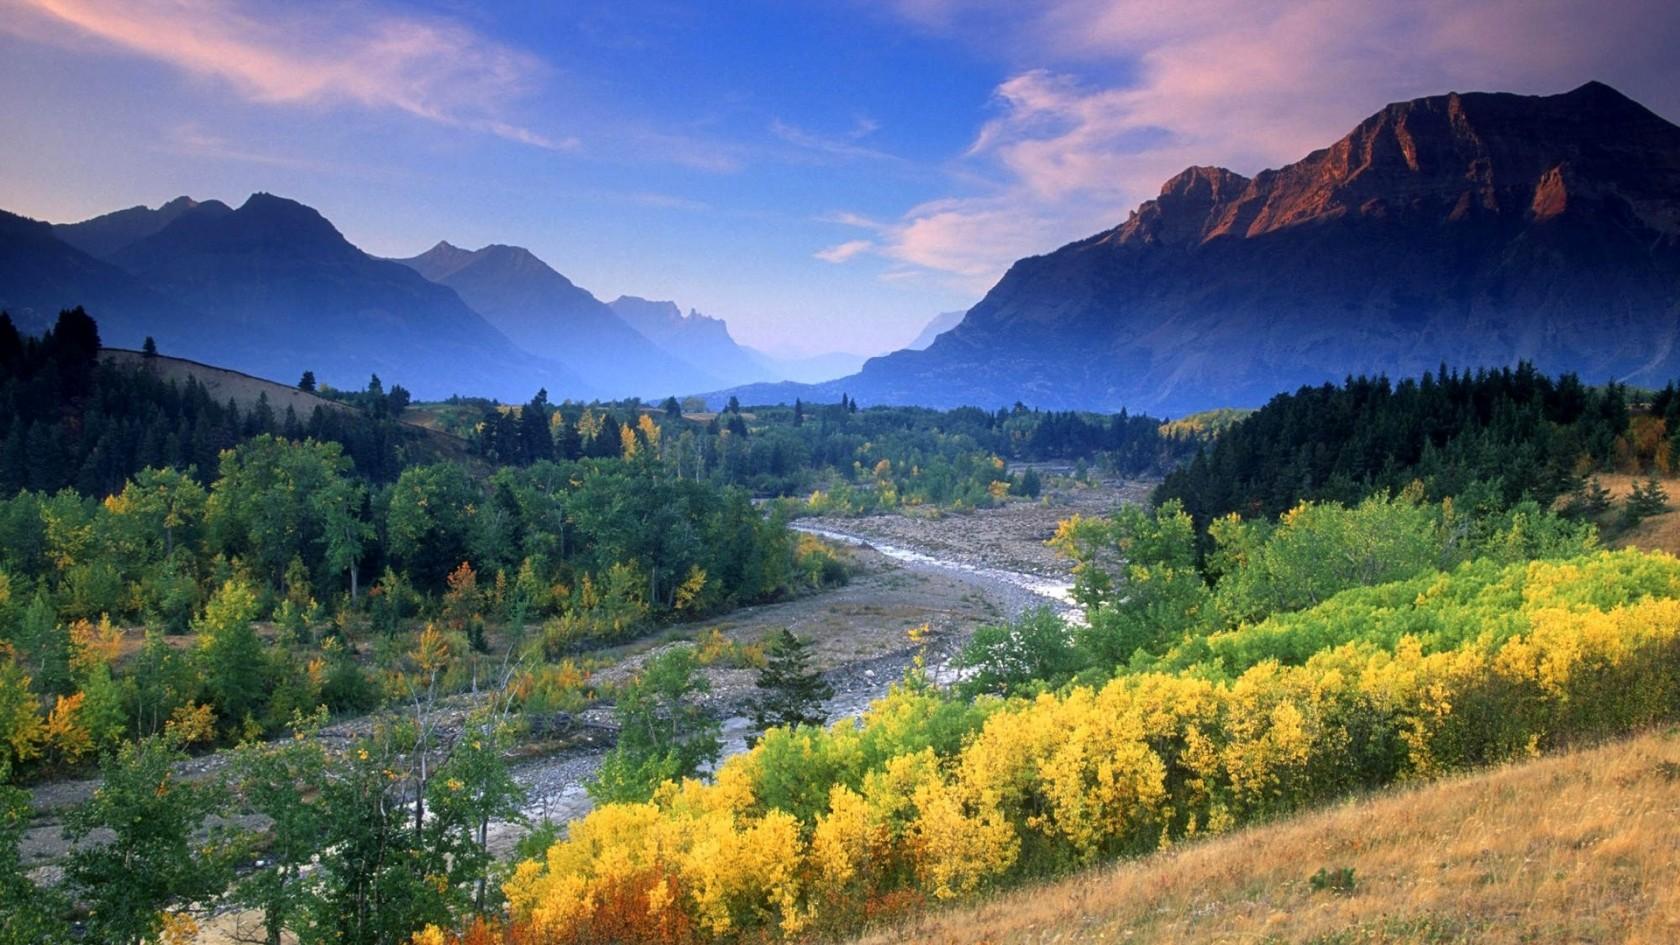 Nature-Landscape-Photography-HD-Wallpaper